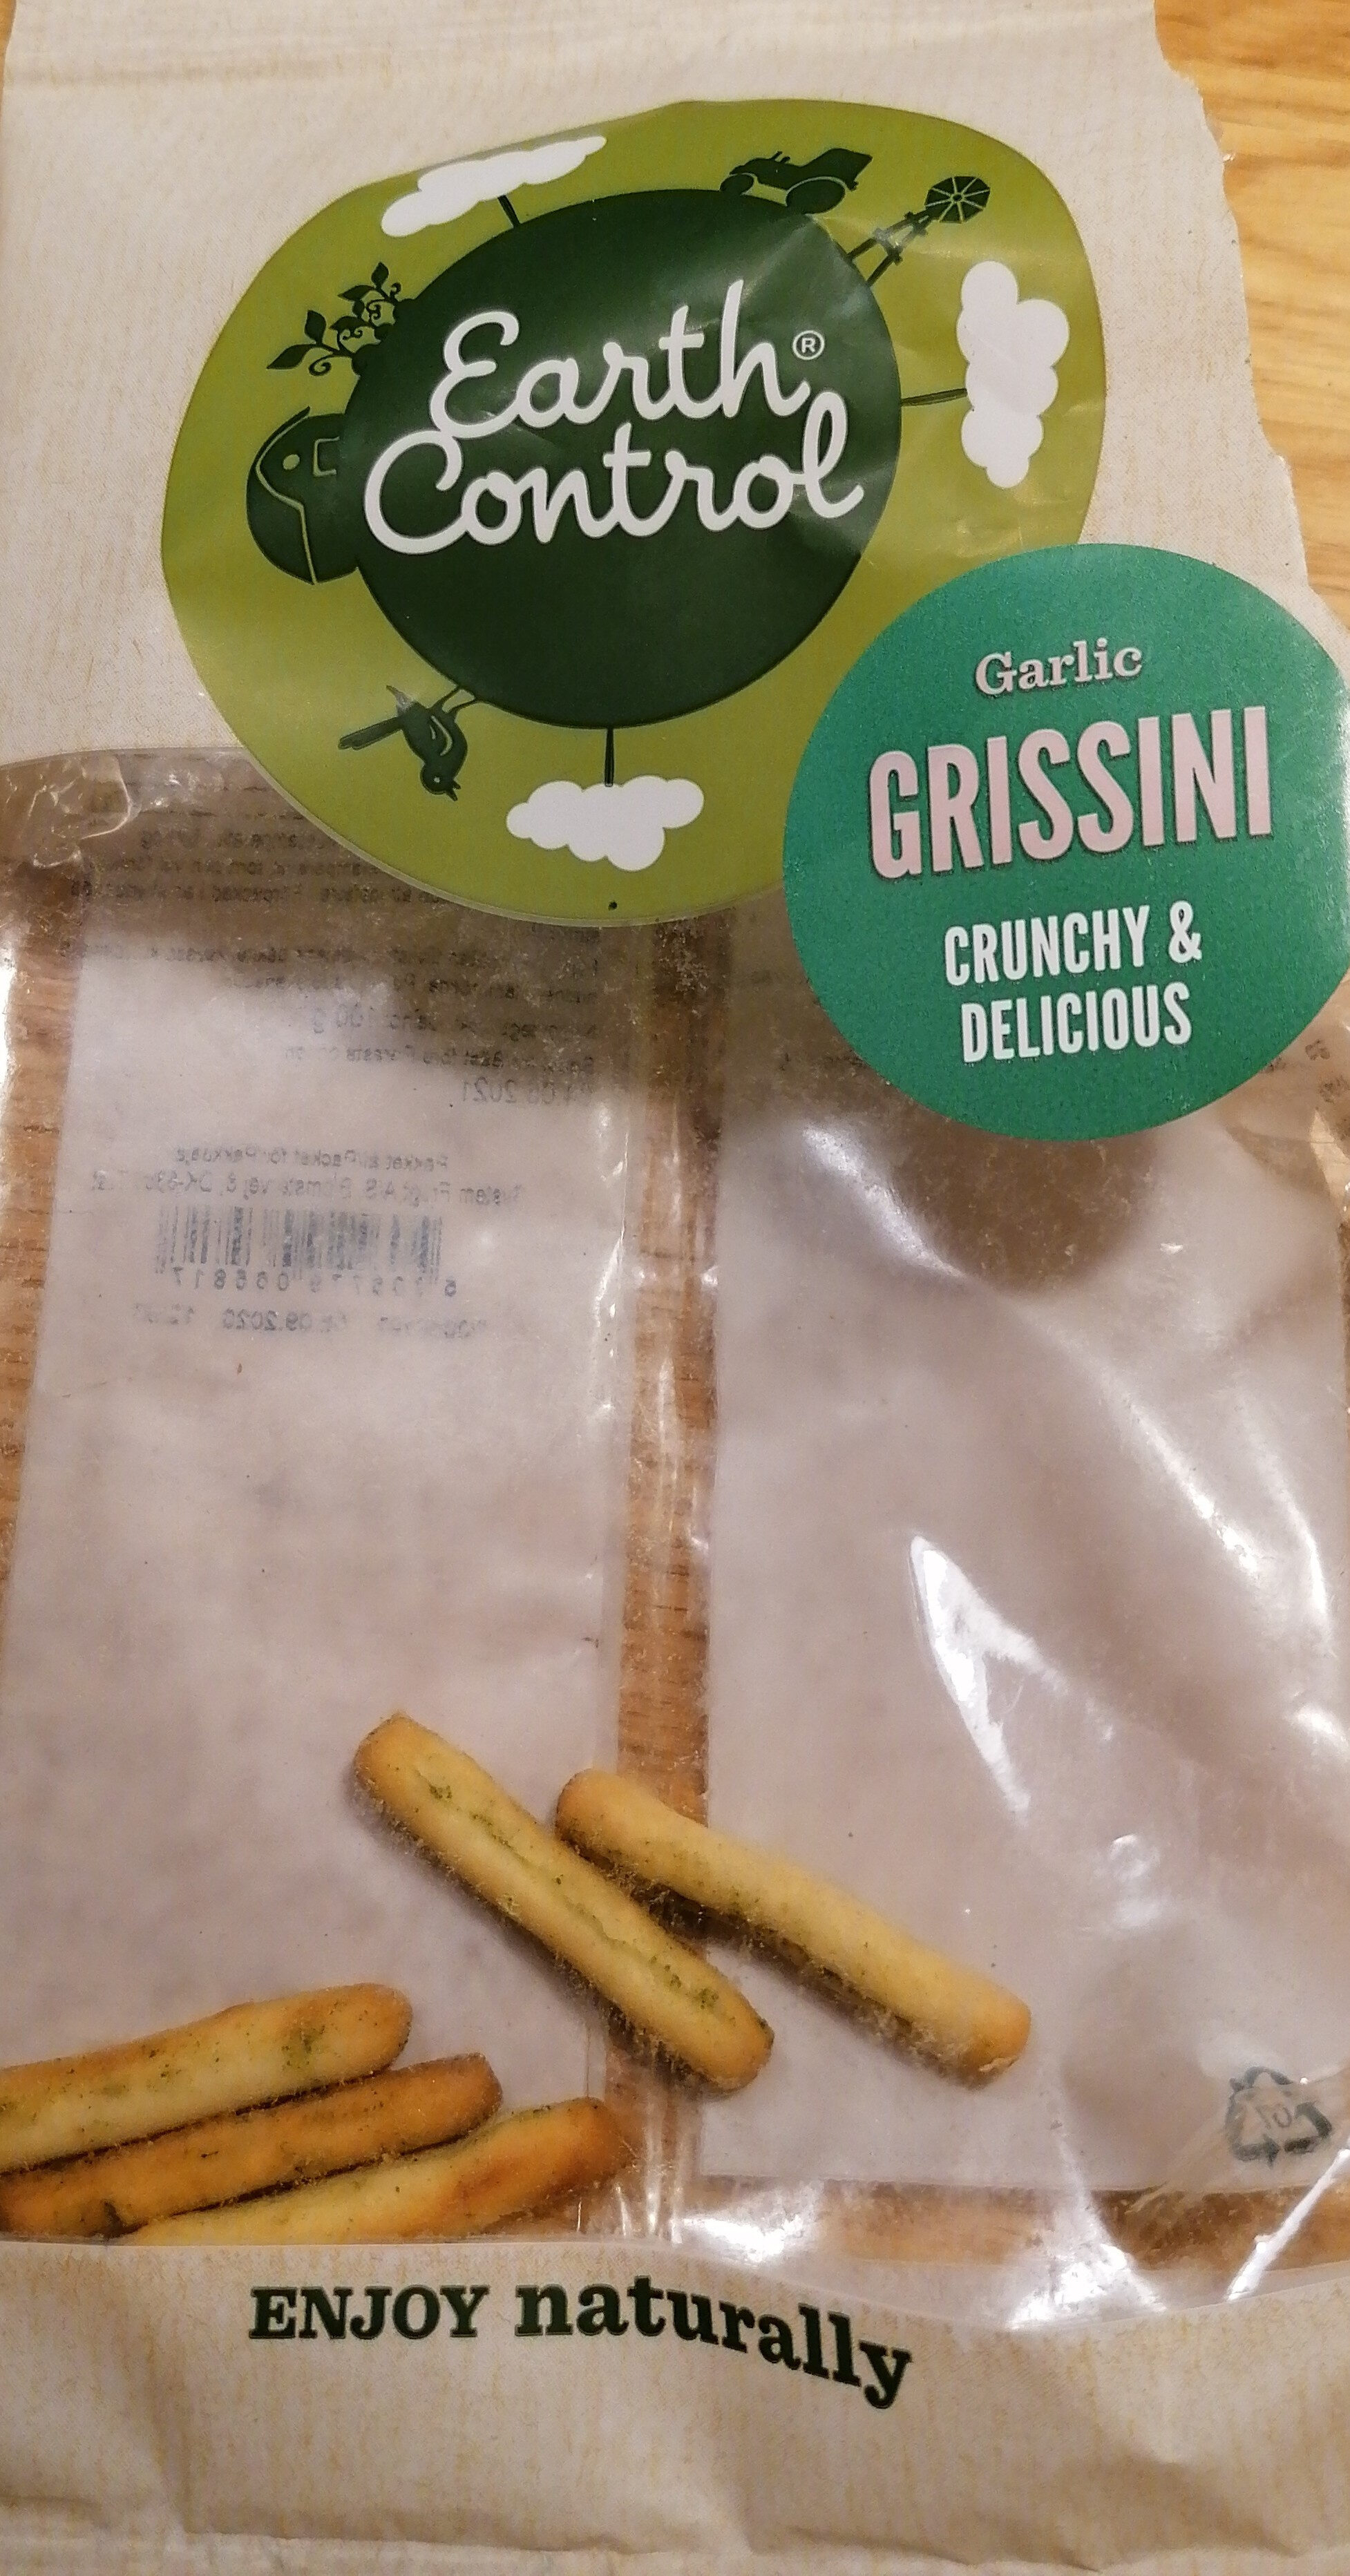 Earth controll garlic grissini - Produit - sv